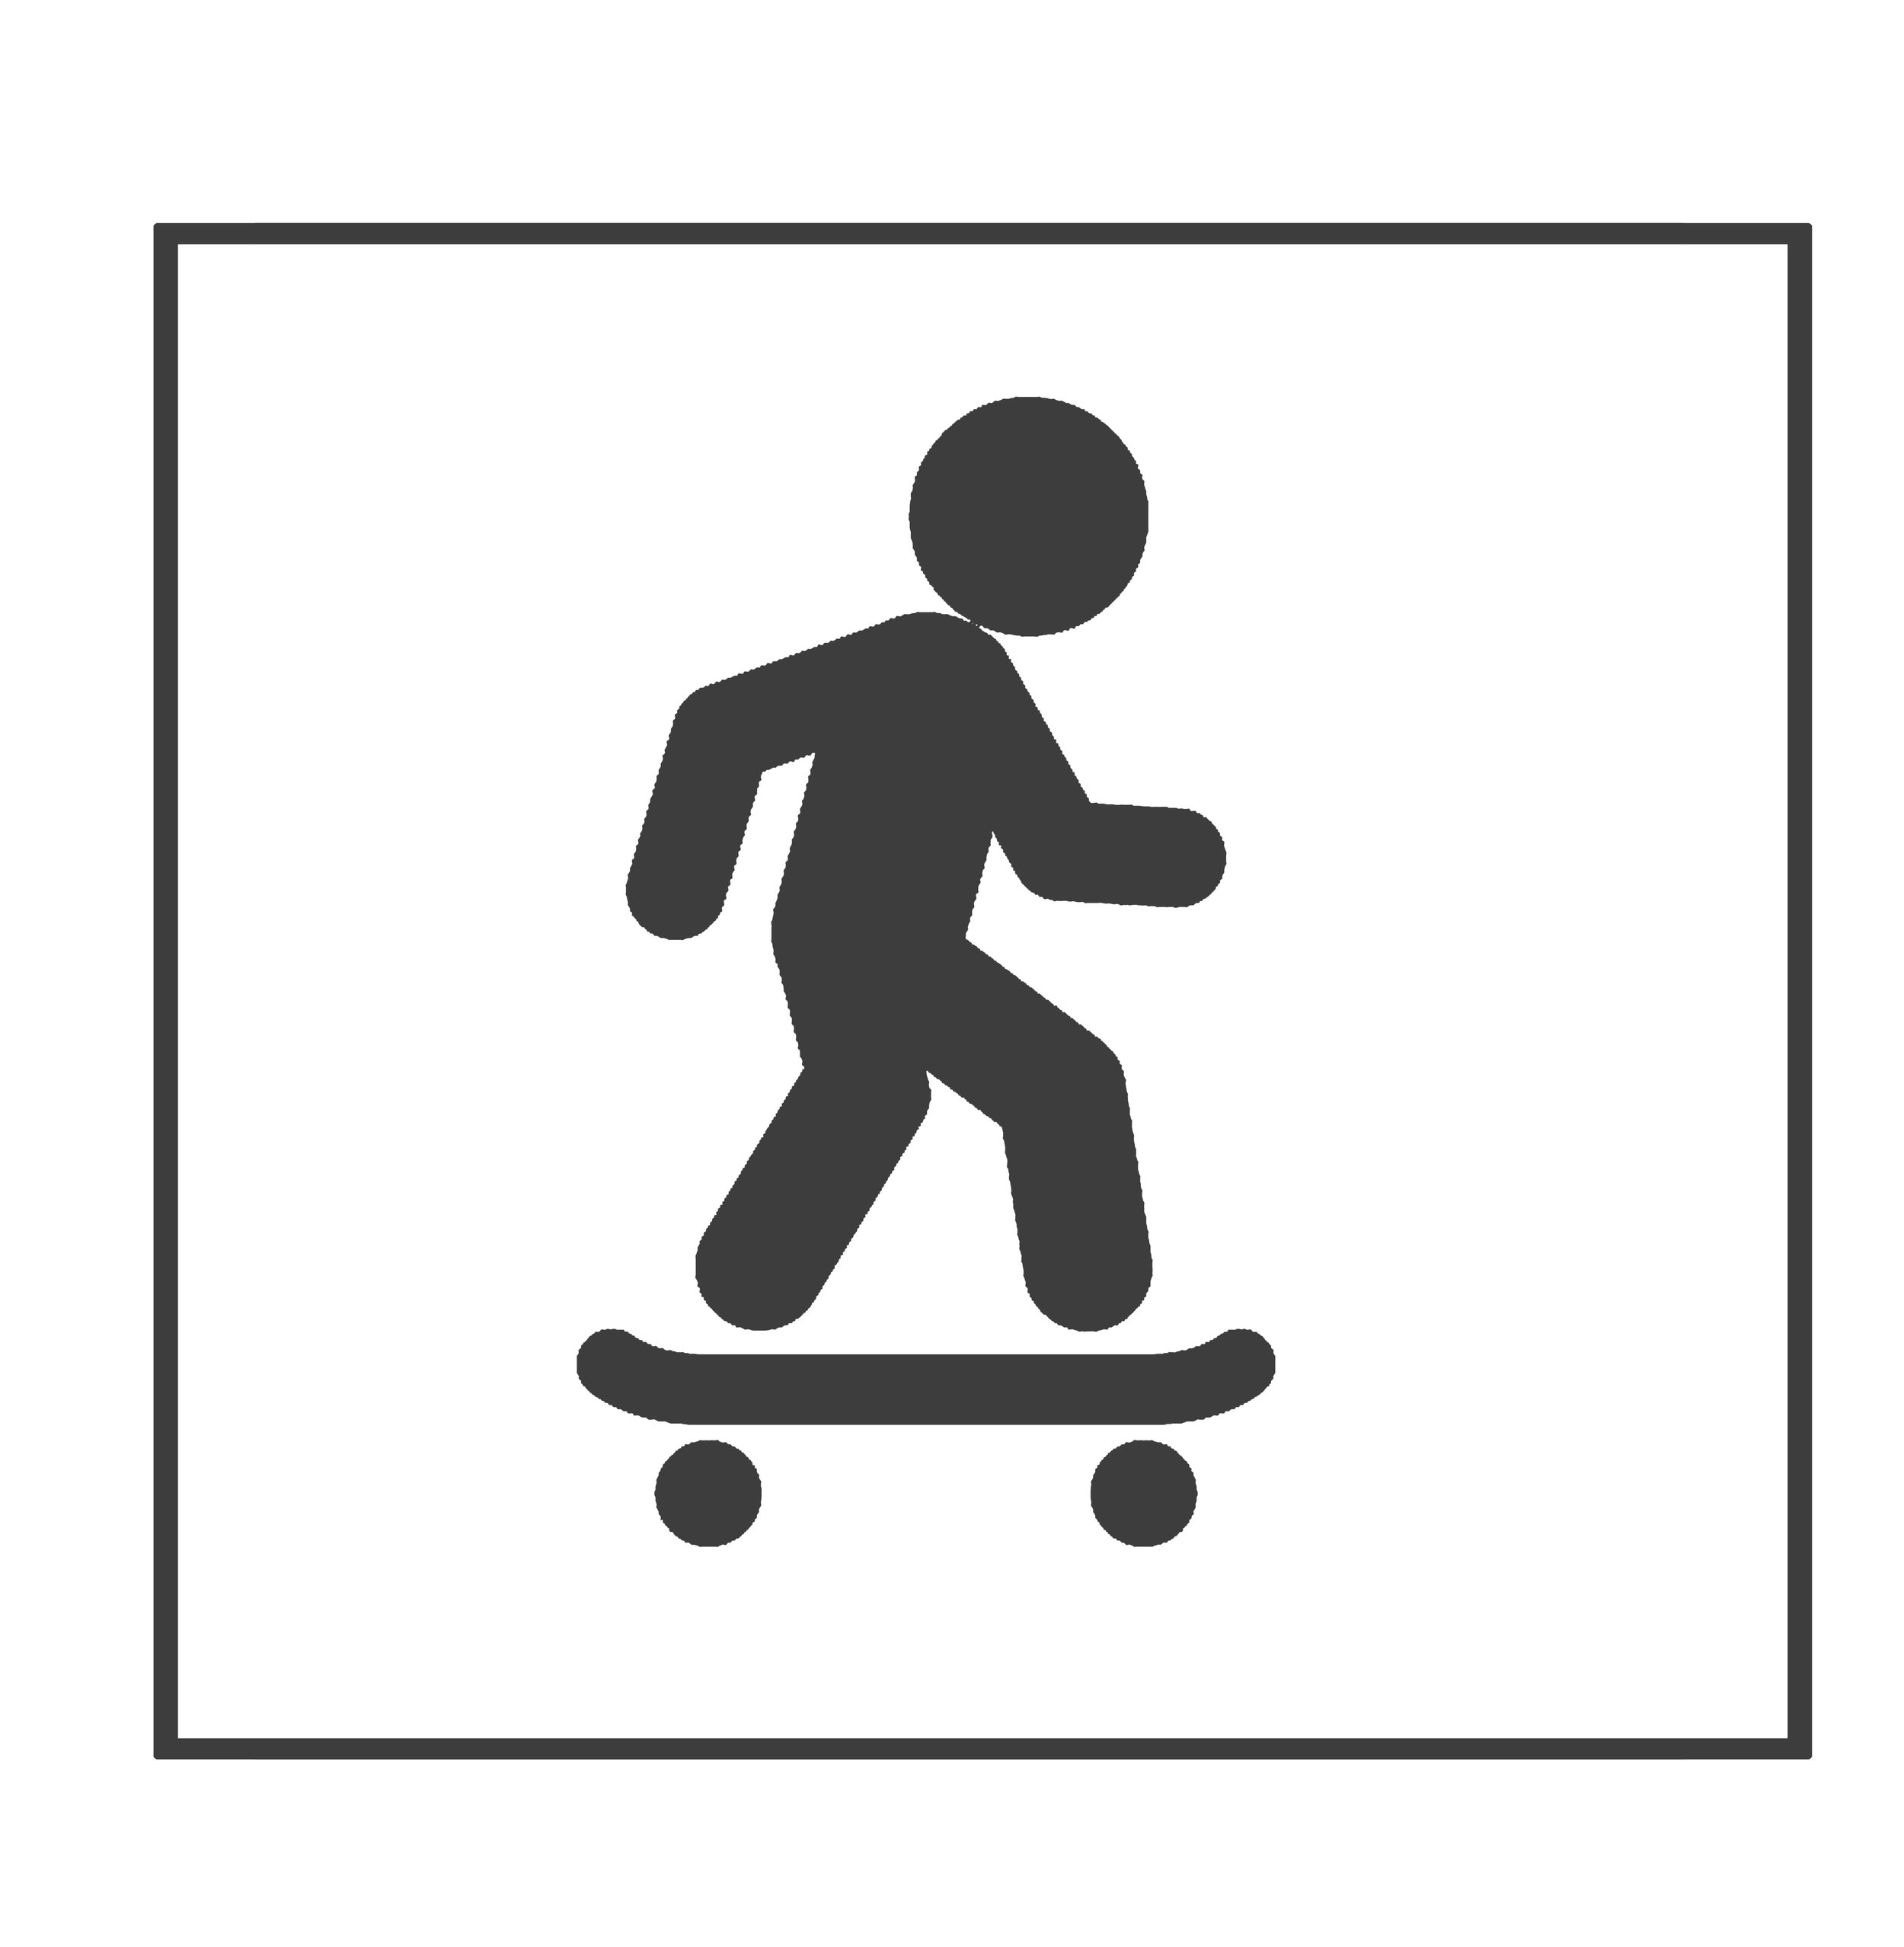 skateboarder-icon-grey.jpg